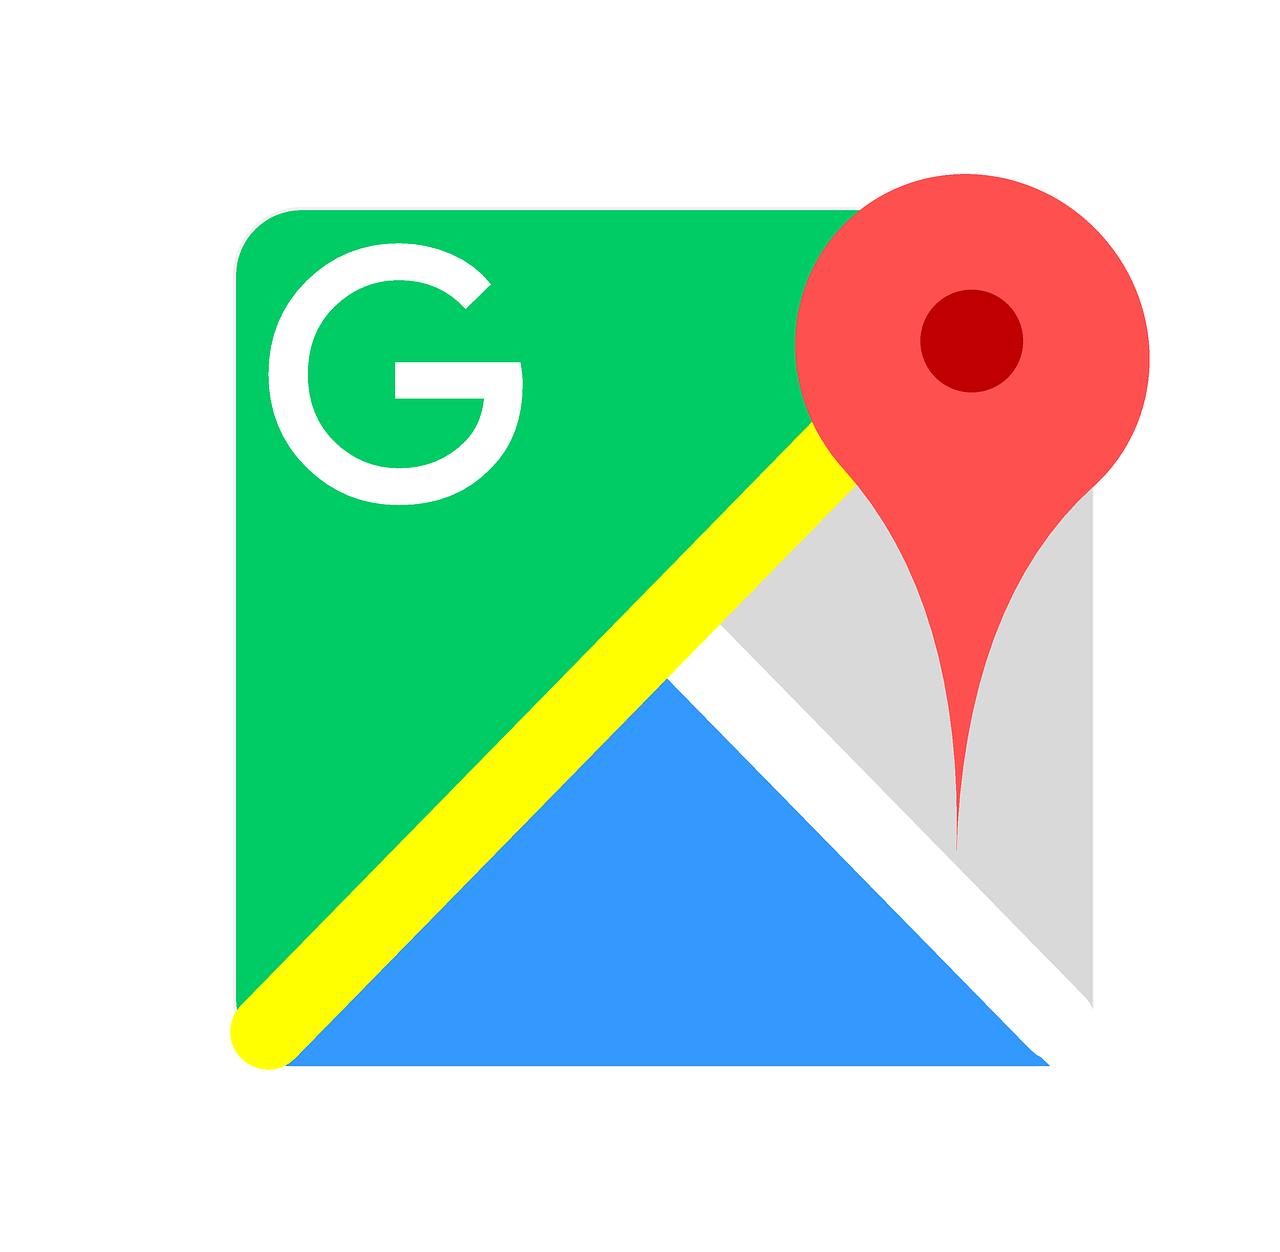 Google Maps Navigation Gps - Free image on Pixabay